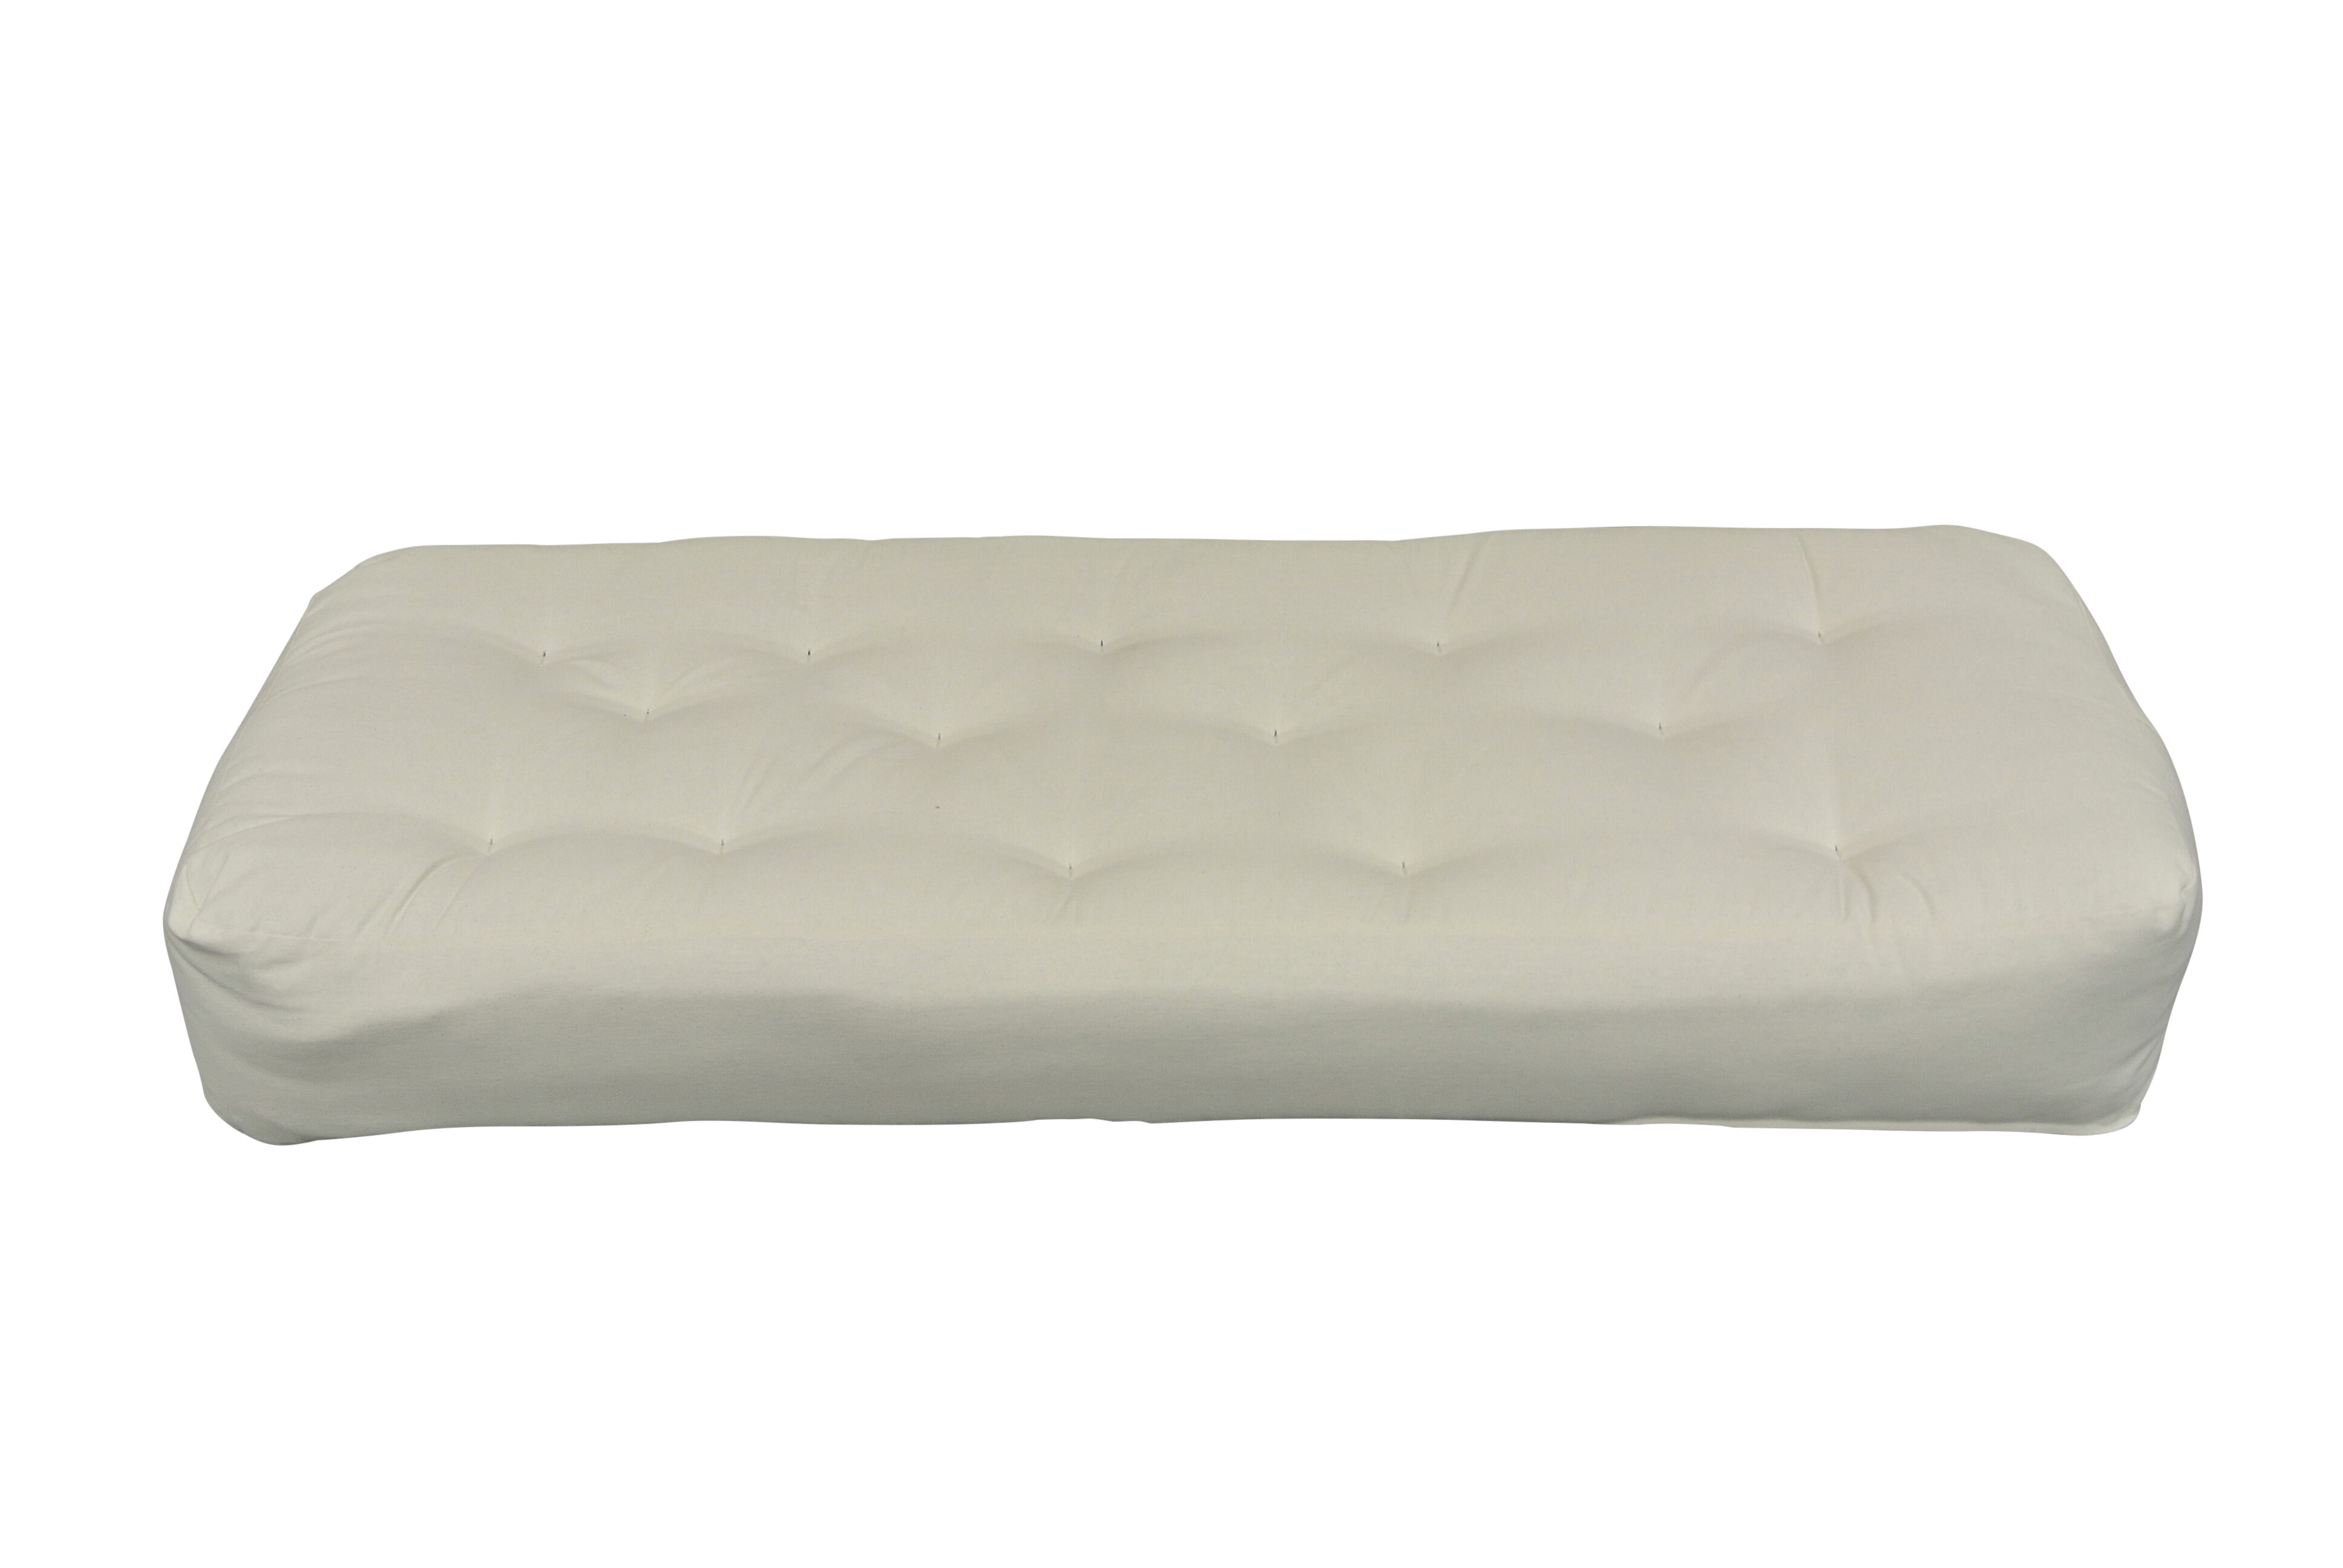 Gold Bond Wool Wrap 8 Cotton Ottoman Futon Mattress Wayfair